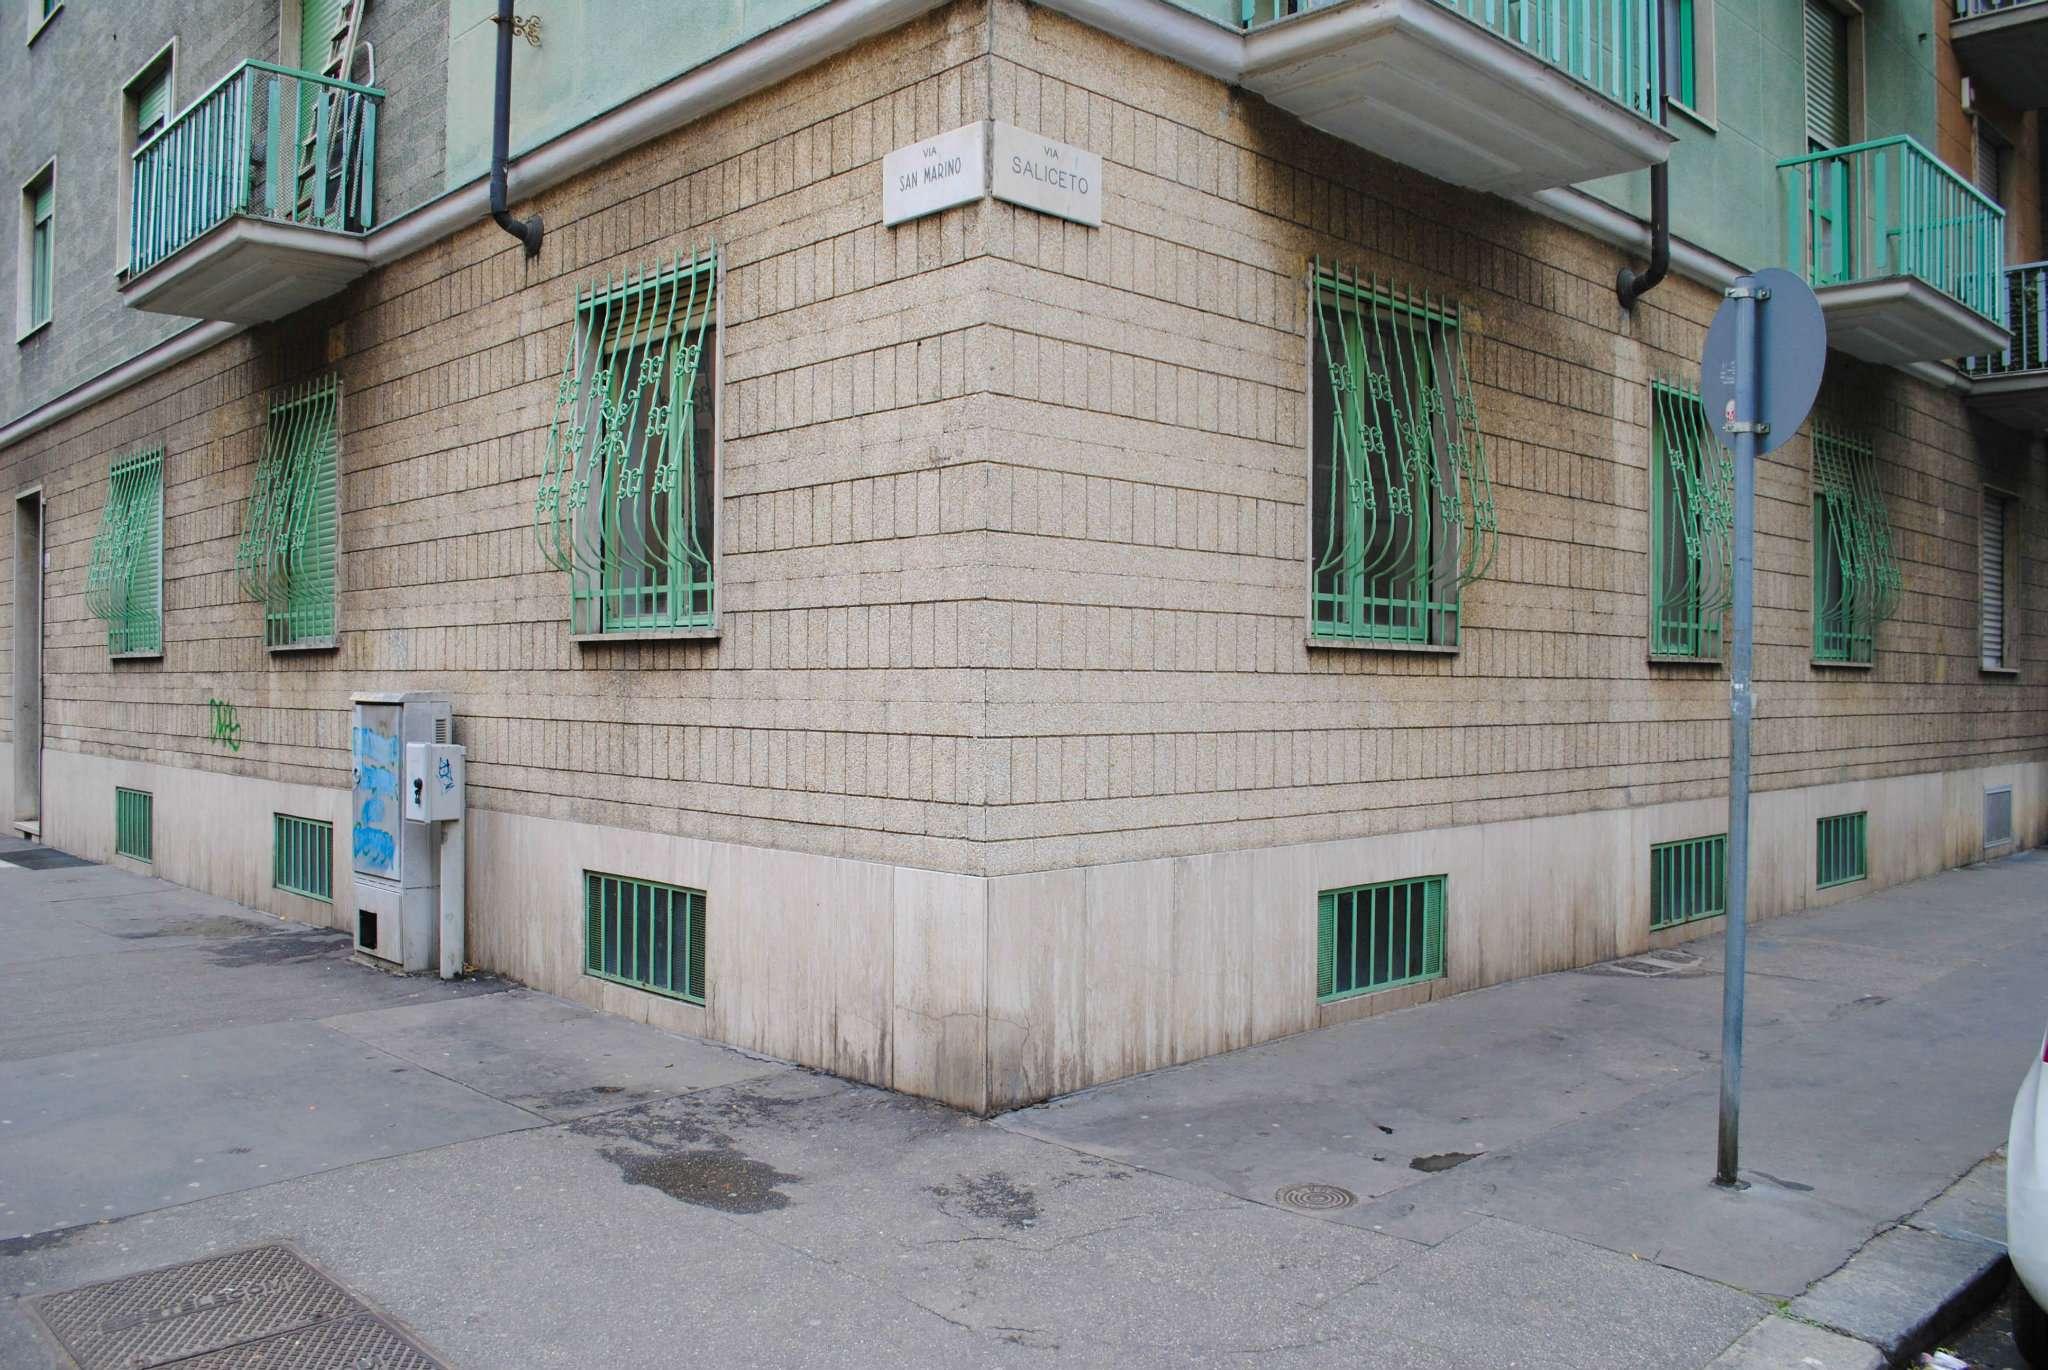 Ufficio in affitto Zona Santa Rita - via San Marino 55 Torino